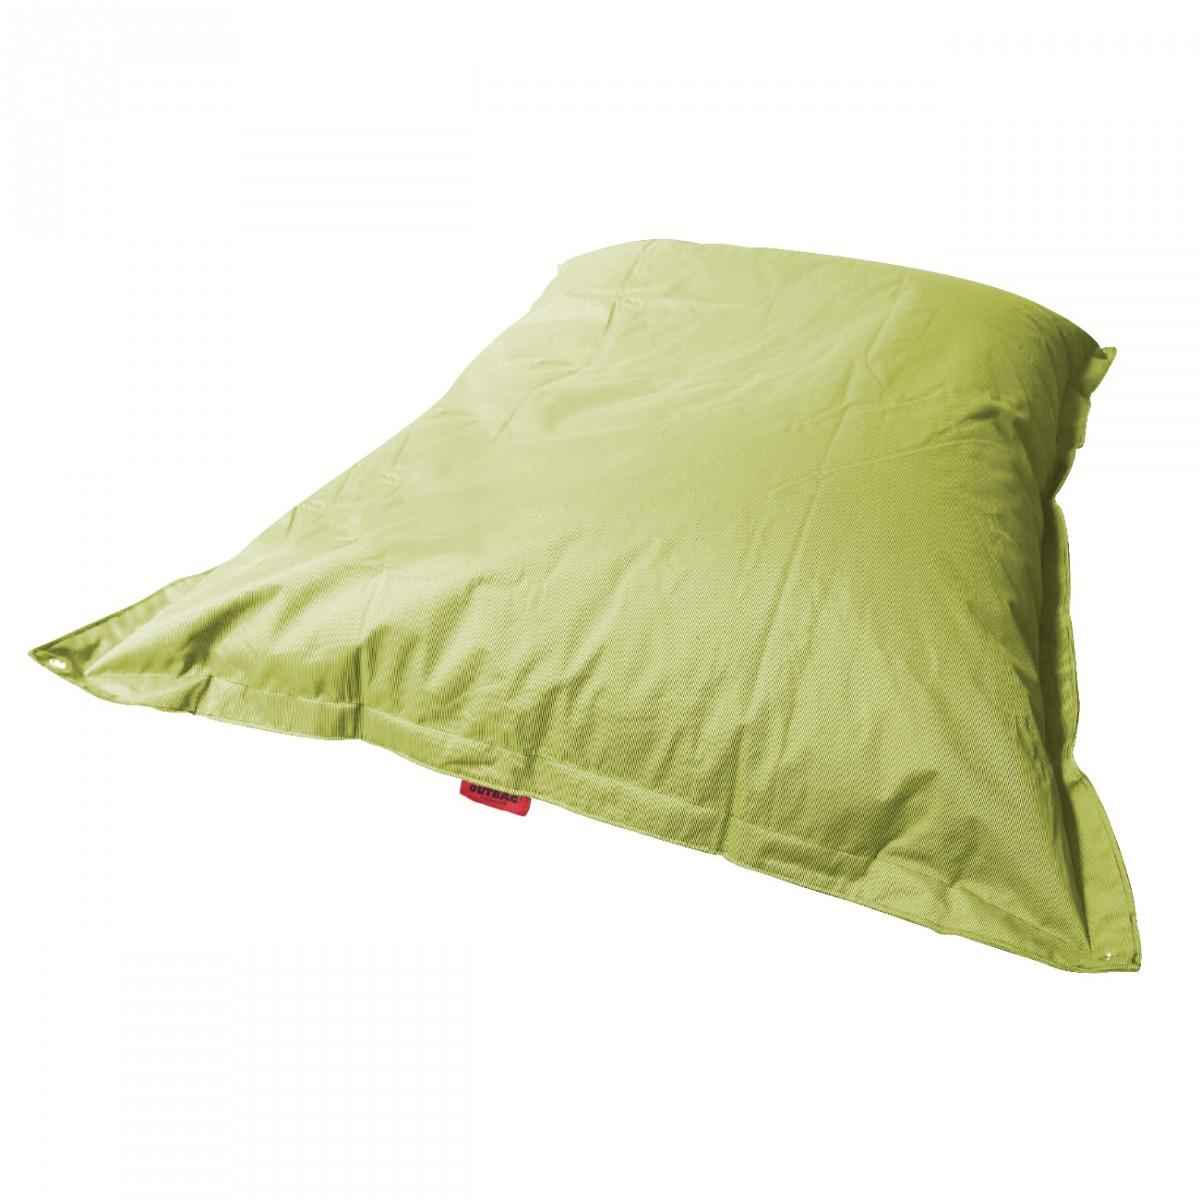 outbag meadow sitzkissen outdoor wellness lounge garten. Black Bedroom Furniture Sets. Home Design Ideas